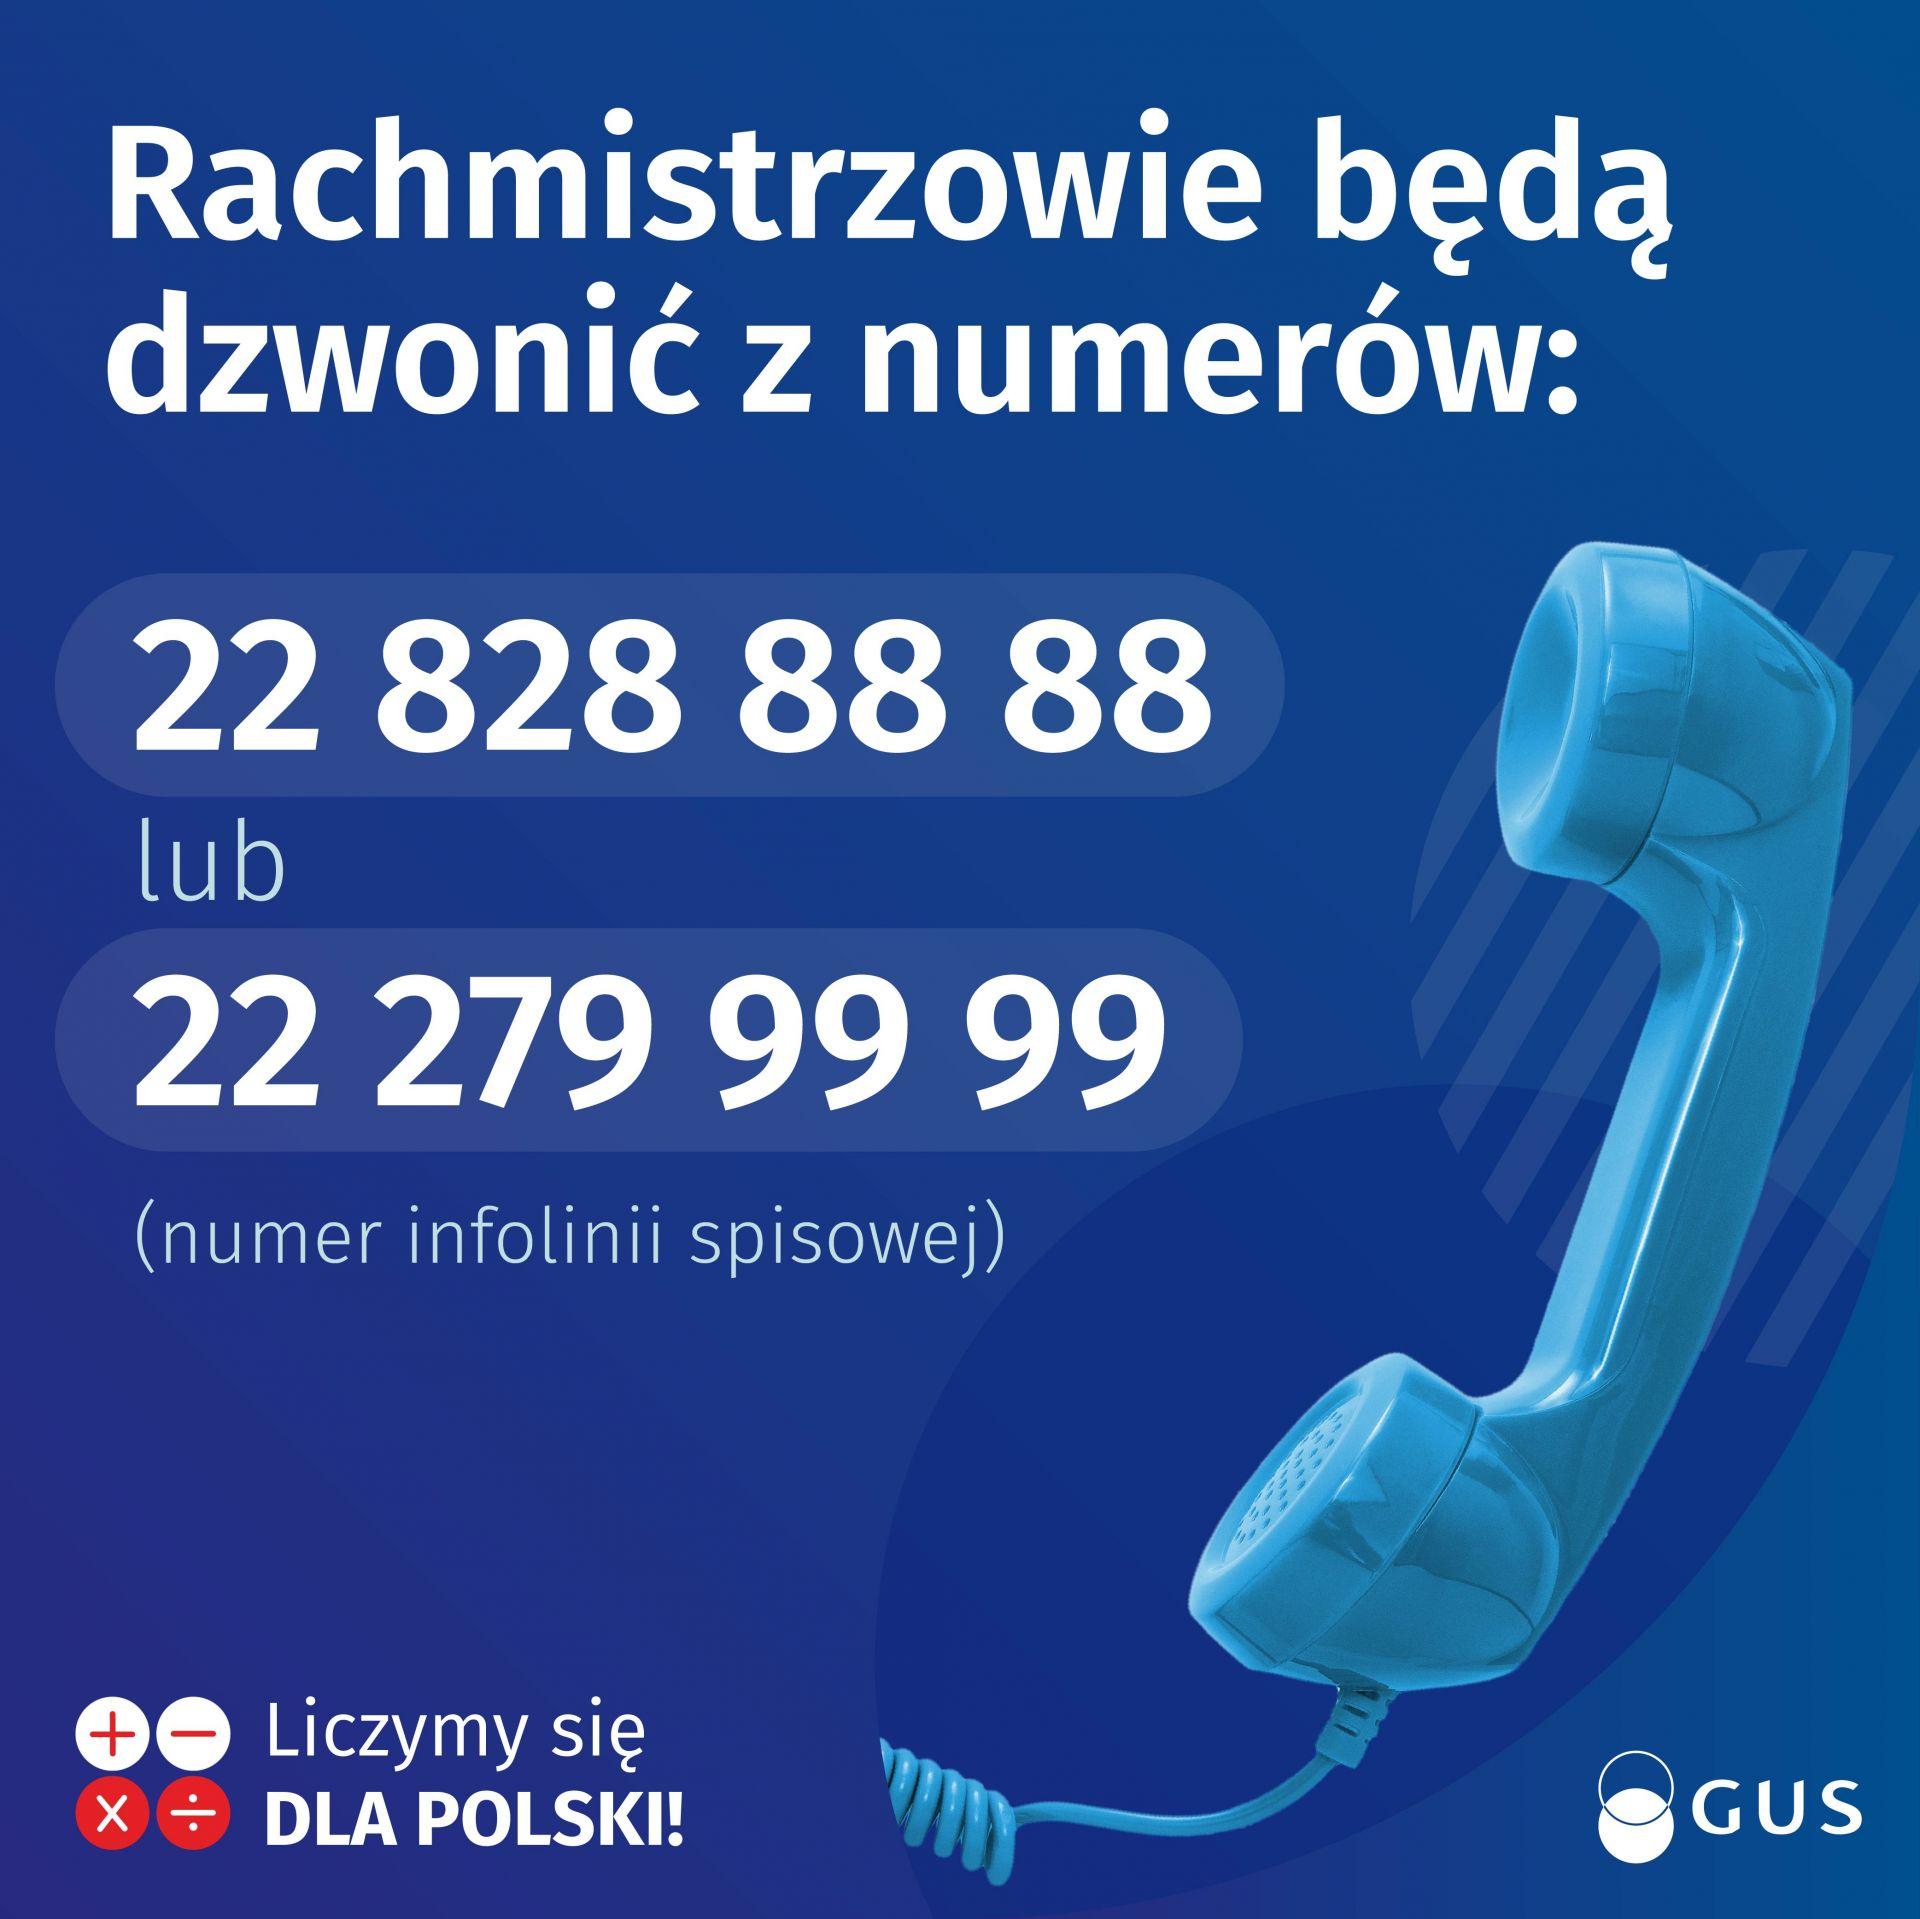 https://www.olesnica.pl/assets/pics/aktualnosci/2021-05/nr_rach-26%20(1).jpg